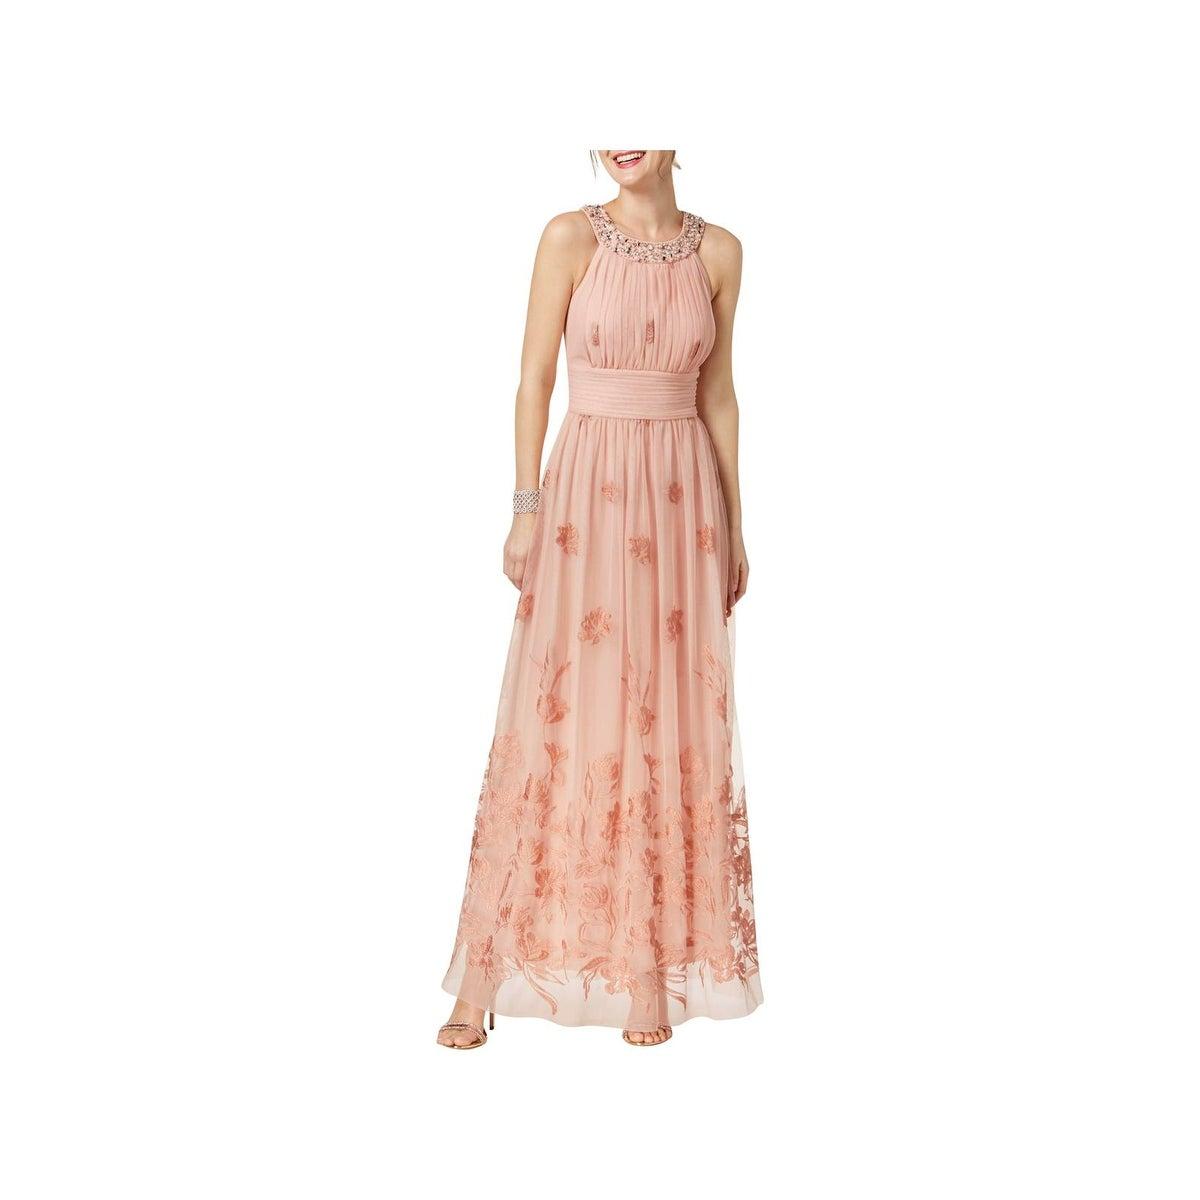 187e99f11c0 Jessica Howard Dillards Special Occasion Dresses - Gomes Weine AG